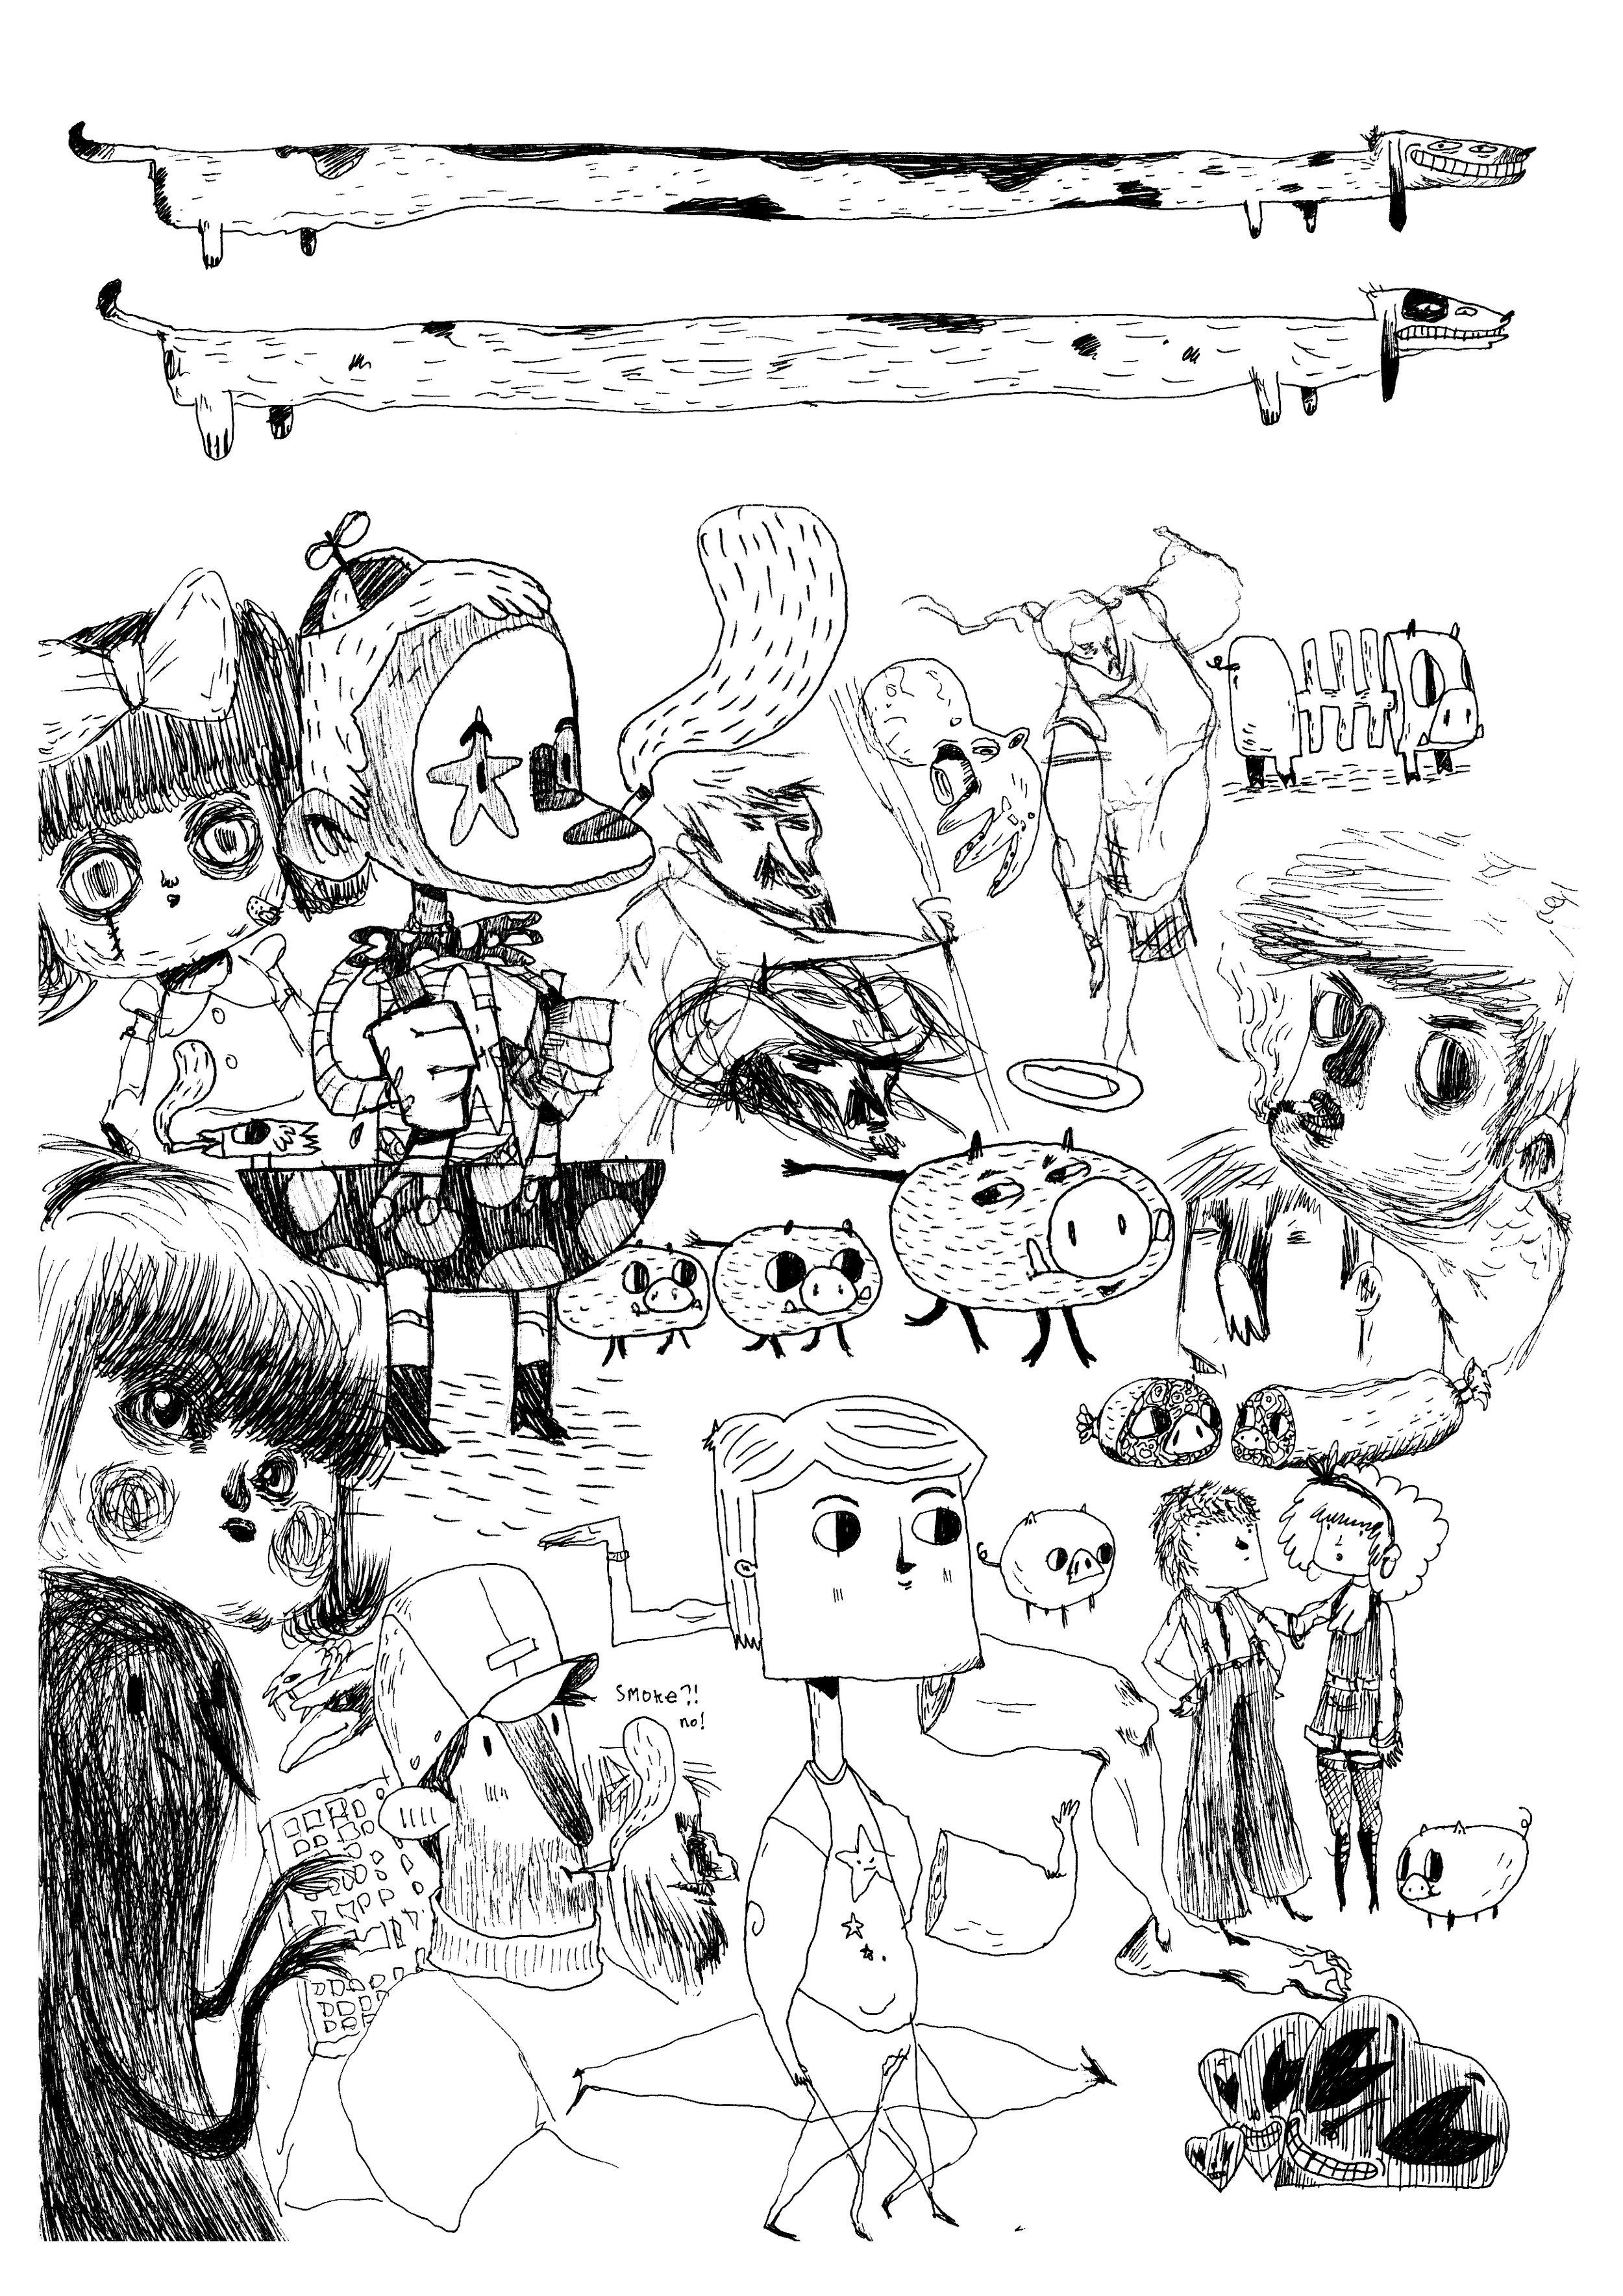 Pascal_Zaffiro_Doodle_13.jpg